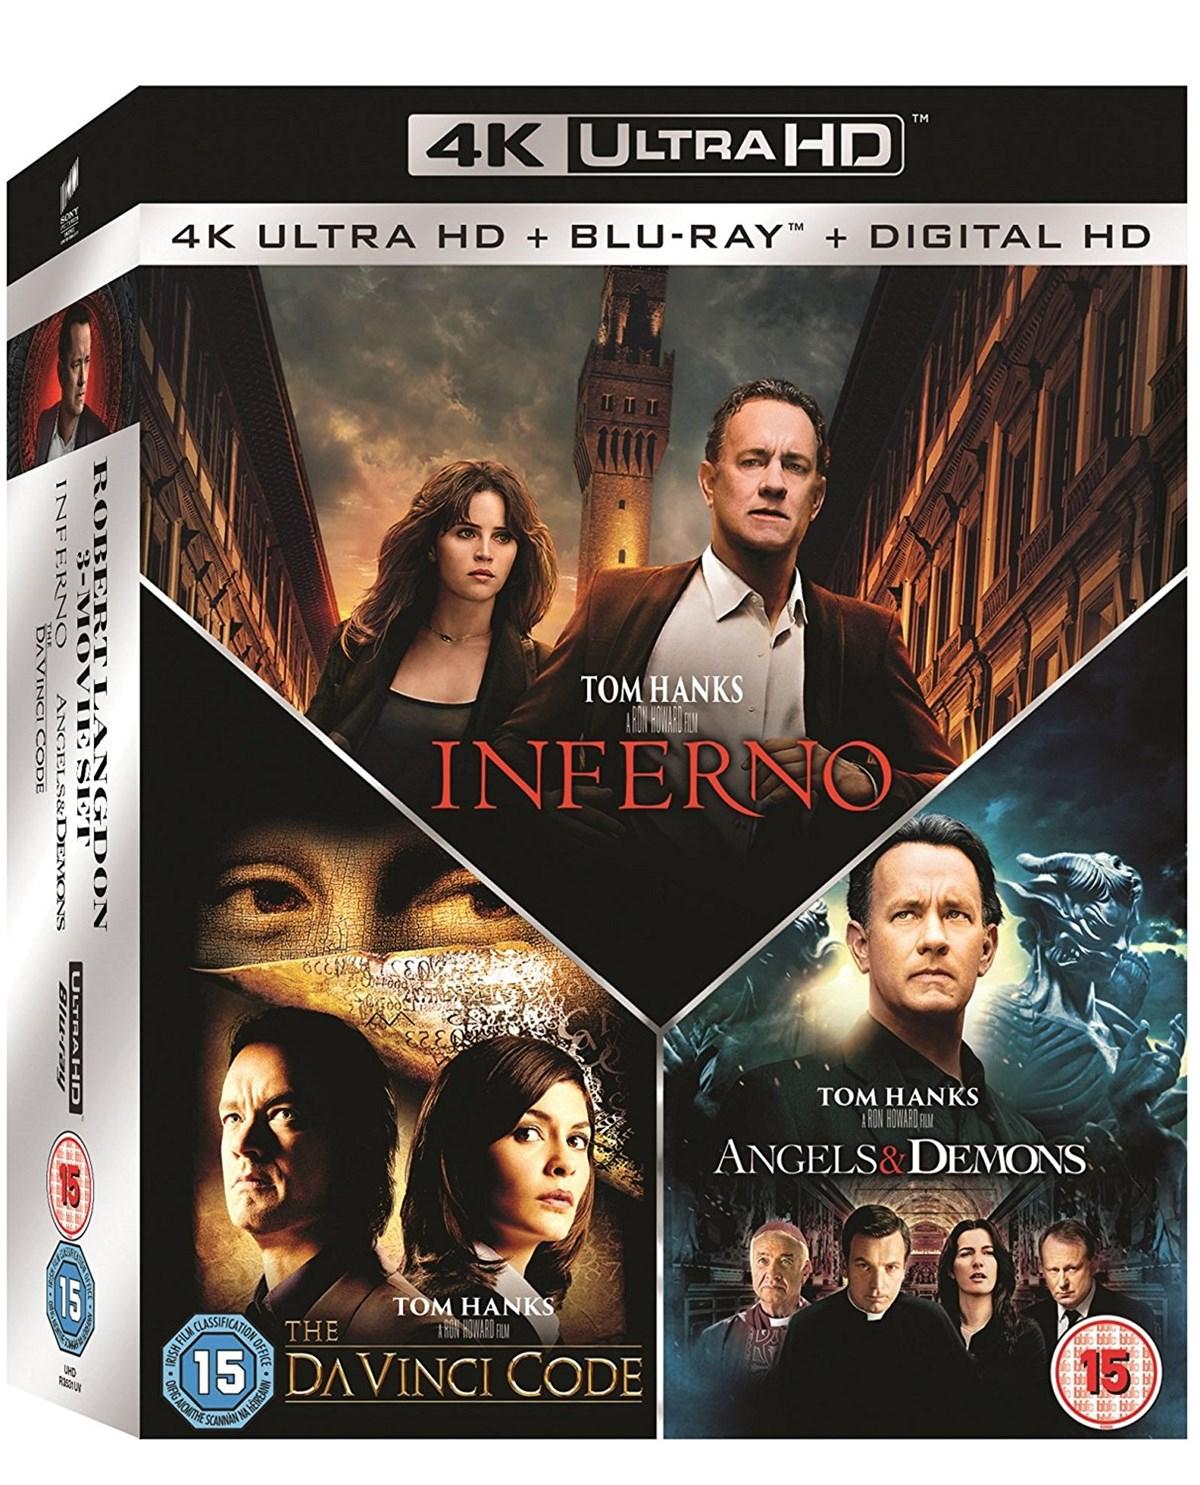 The Da Vinci Code Trilogie mit Sakrileg + Illuminati + Inferno (4K Blu-ray + Blu-ray) für 36,13€